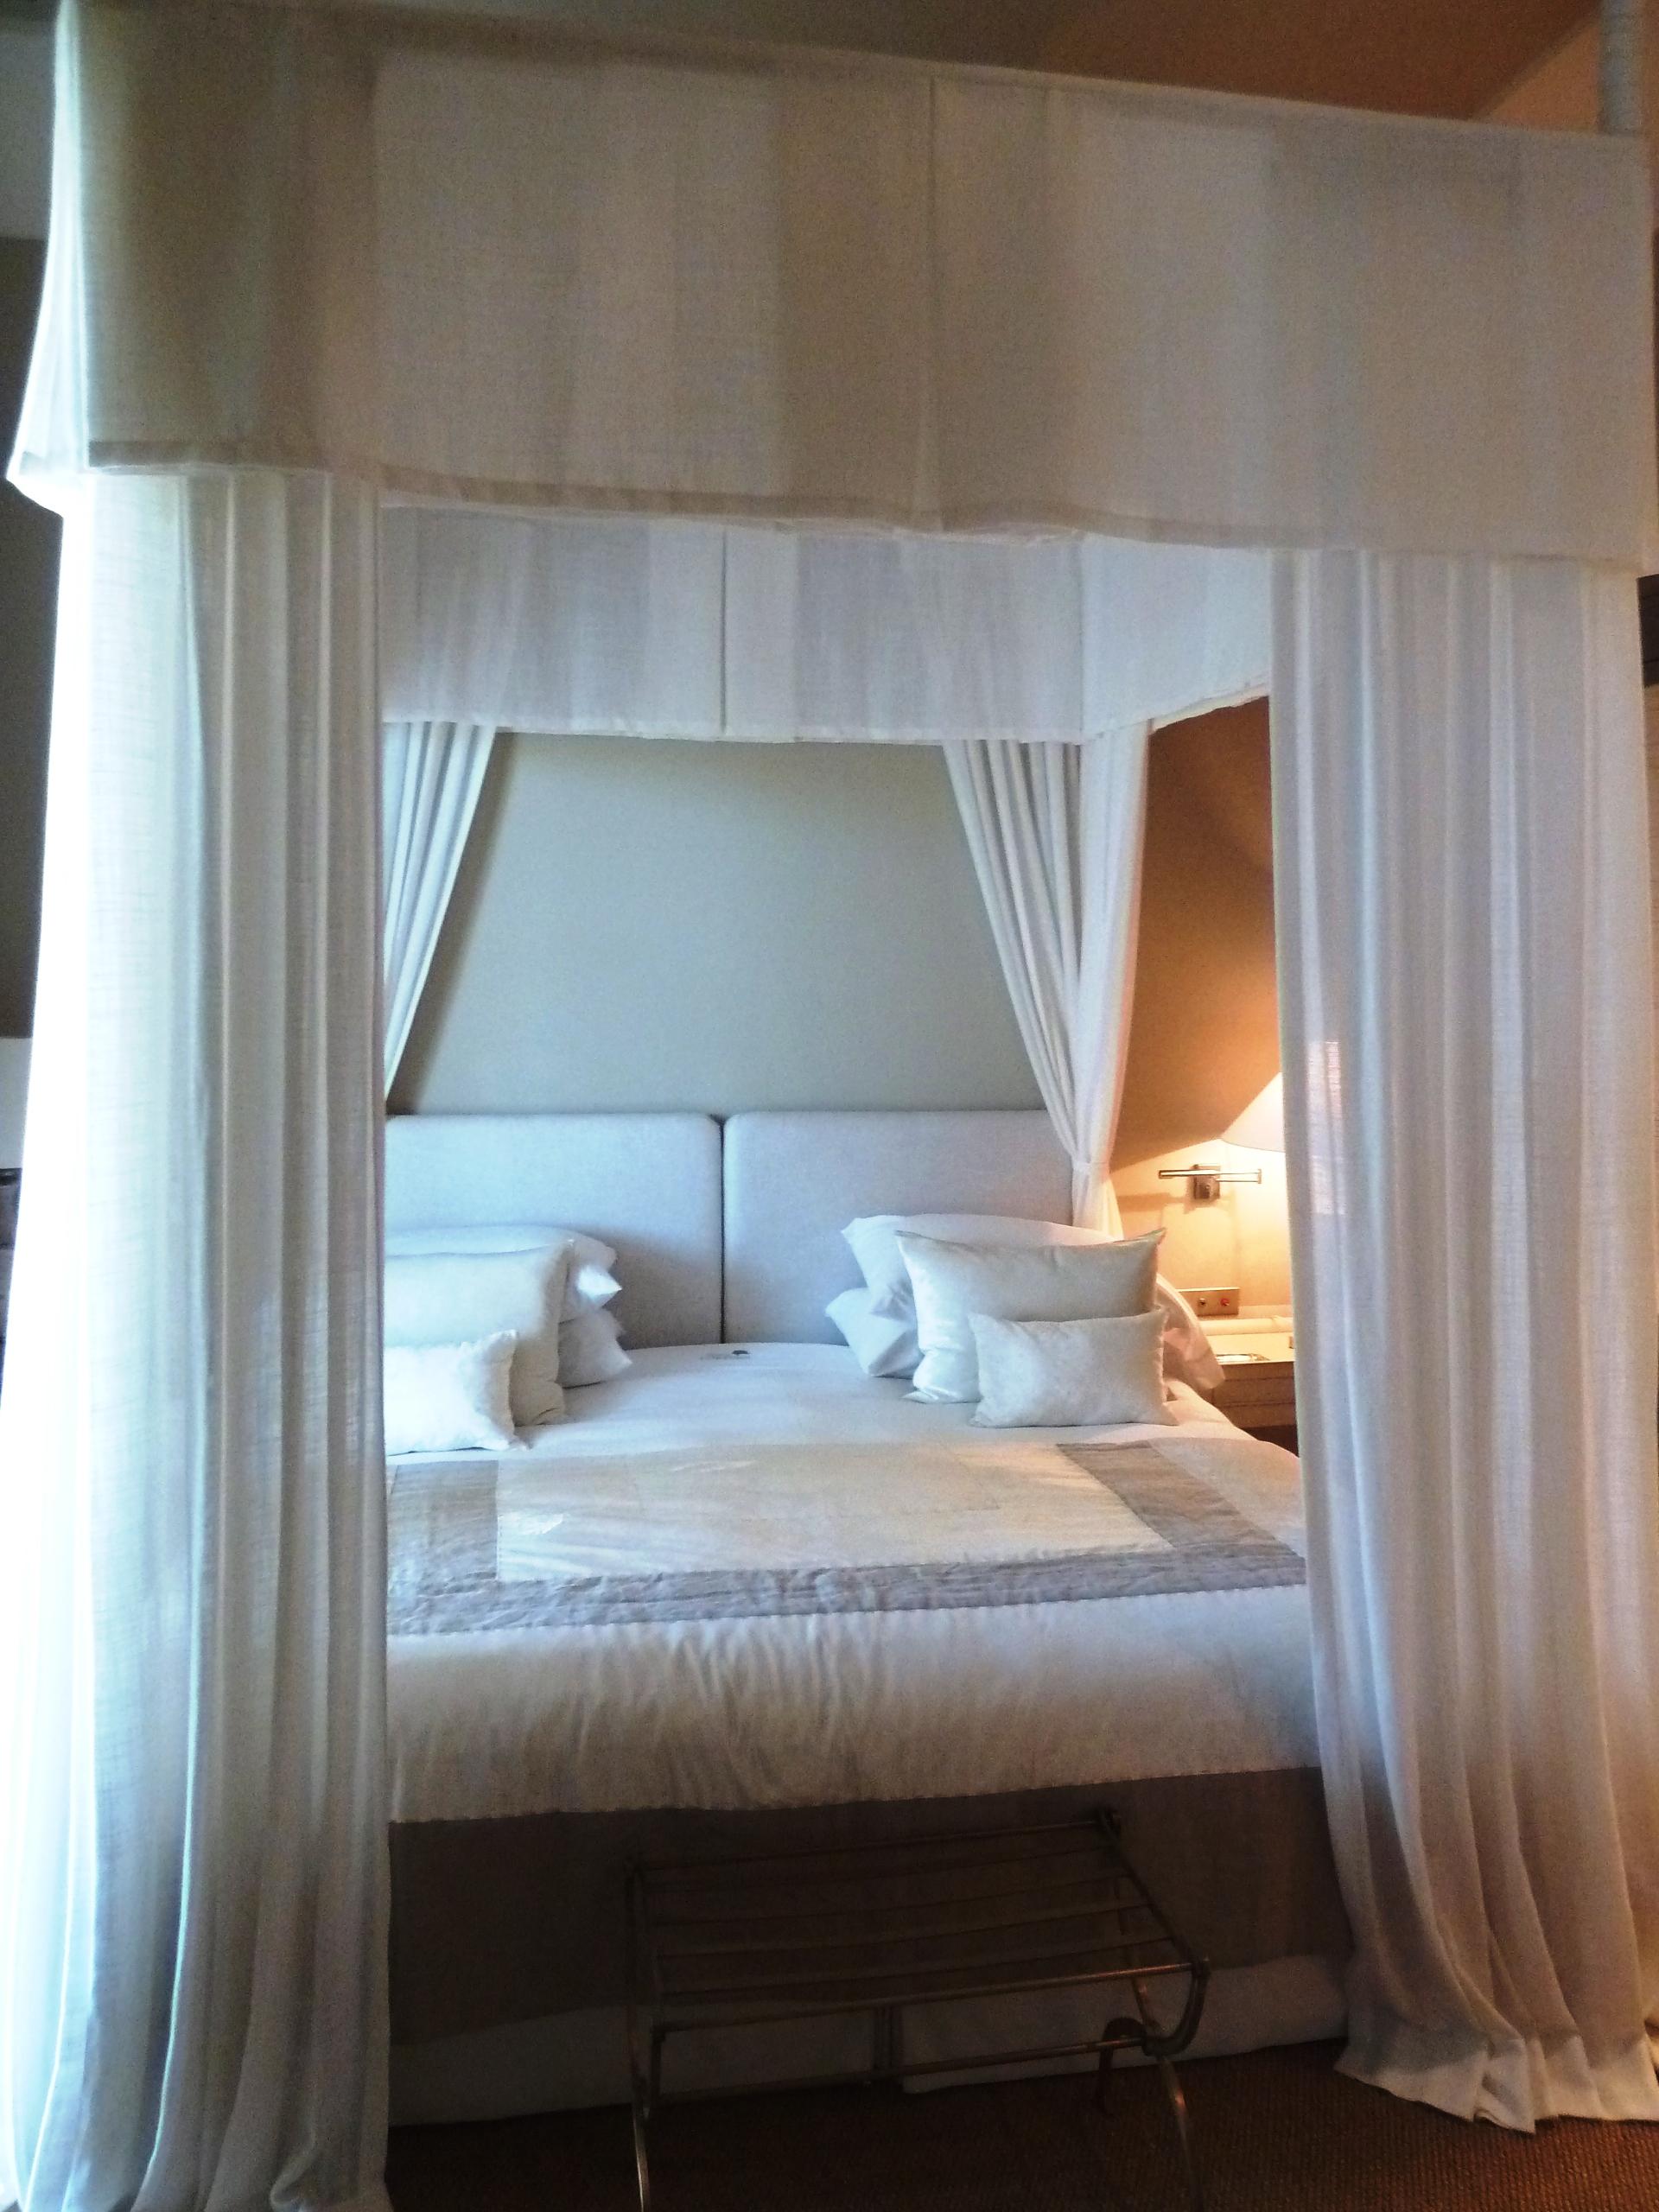 Bed_Exec_Suite_Hotel_Finca_Cortesin_Casares_copyright_www.andrewforbes.com